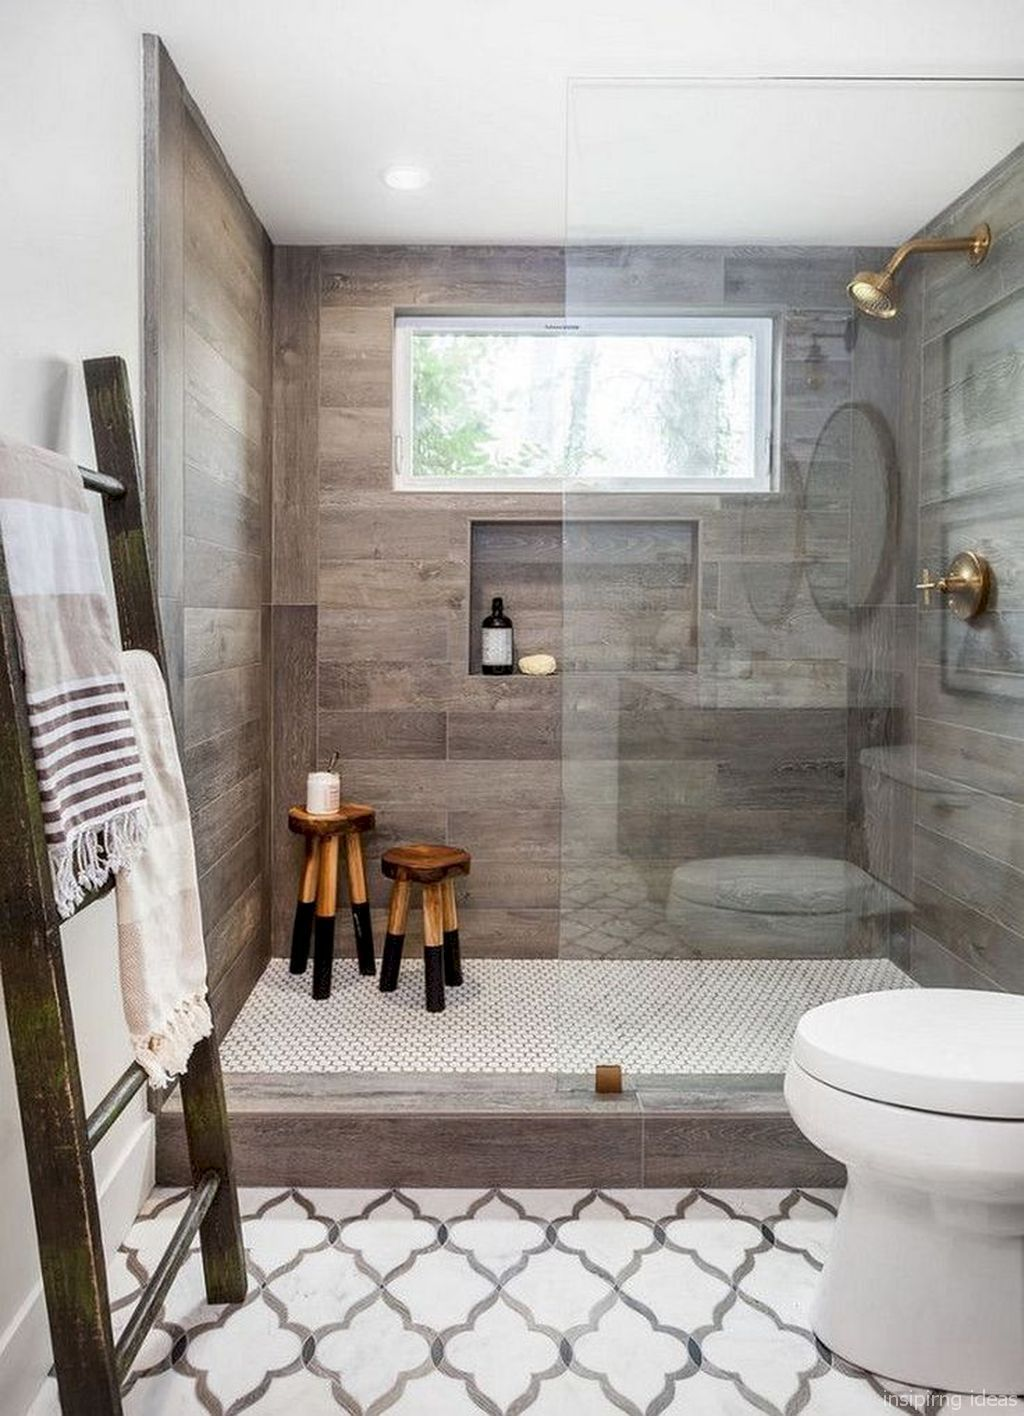 Amazing Image of Farmhouse Bathroom Vanity is